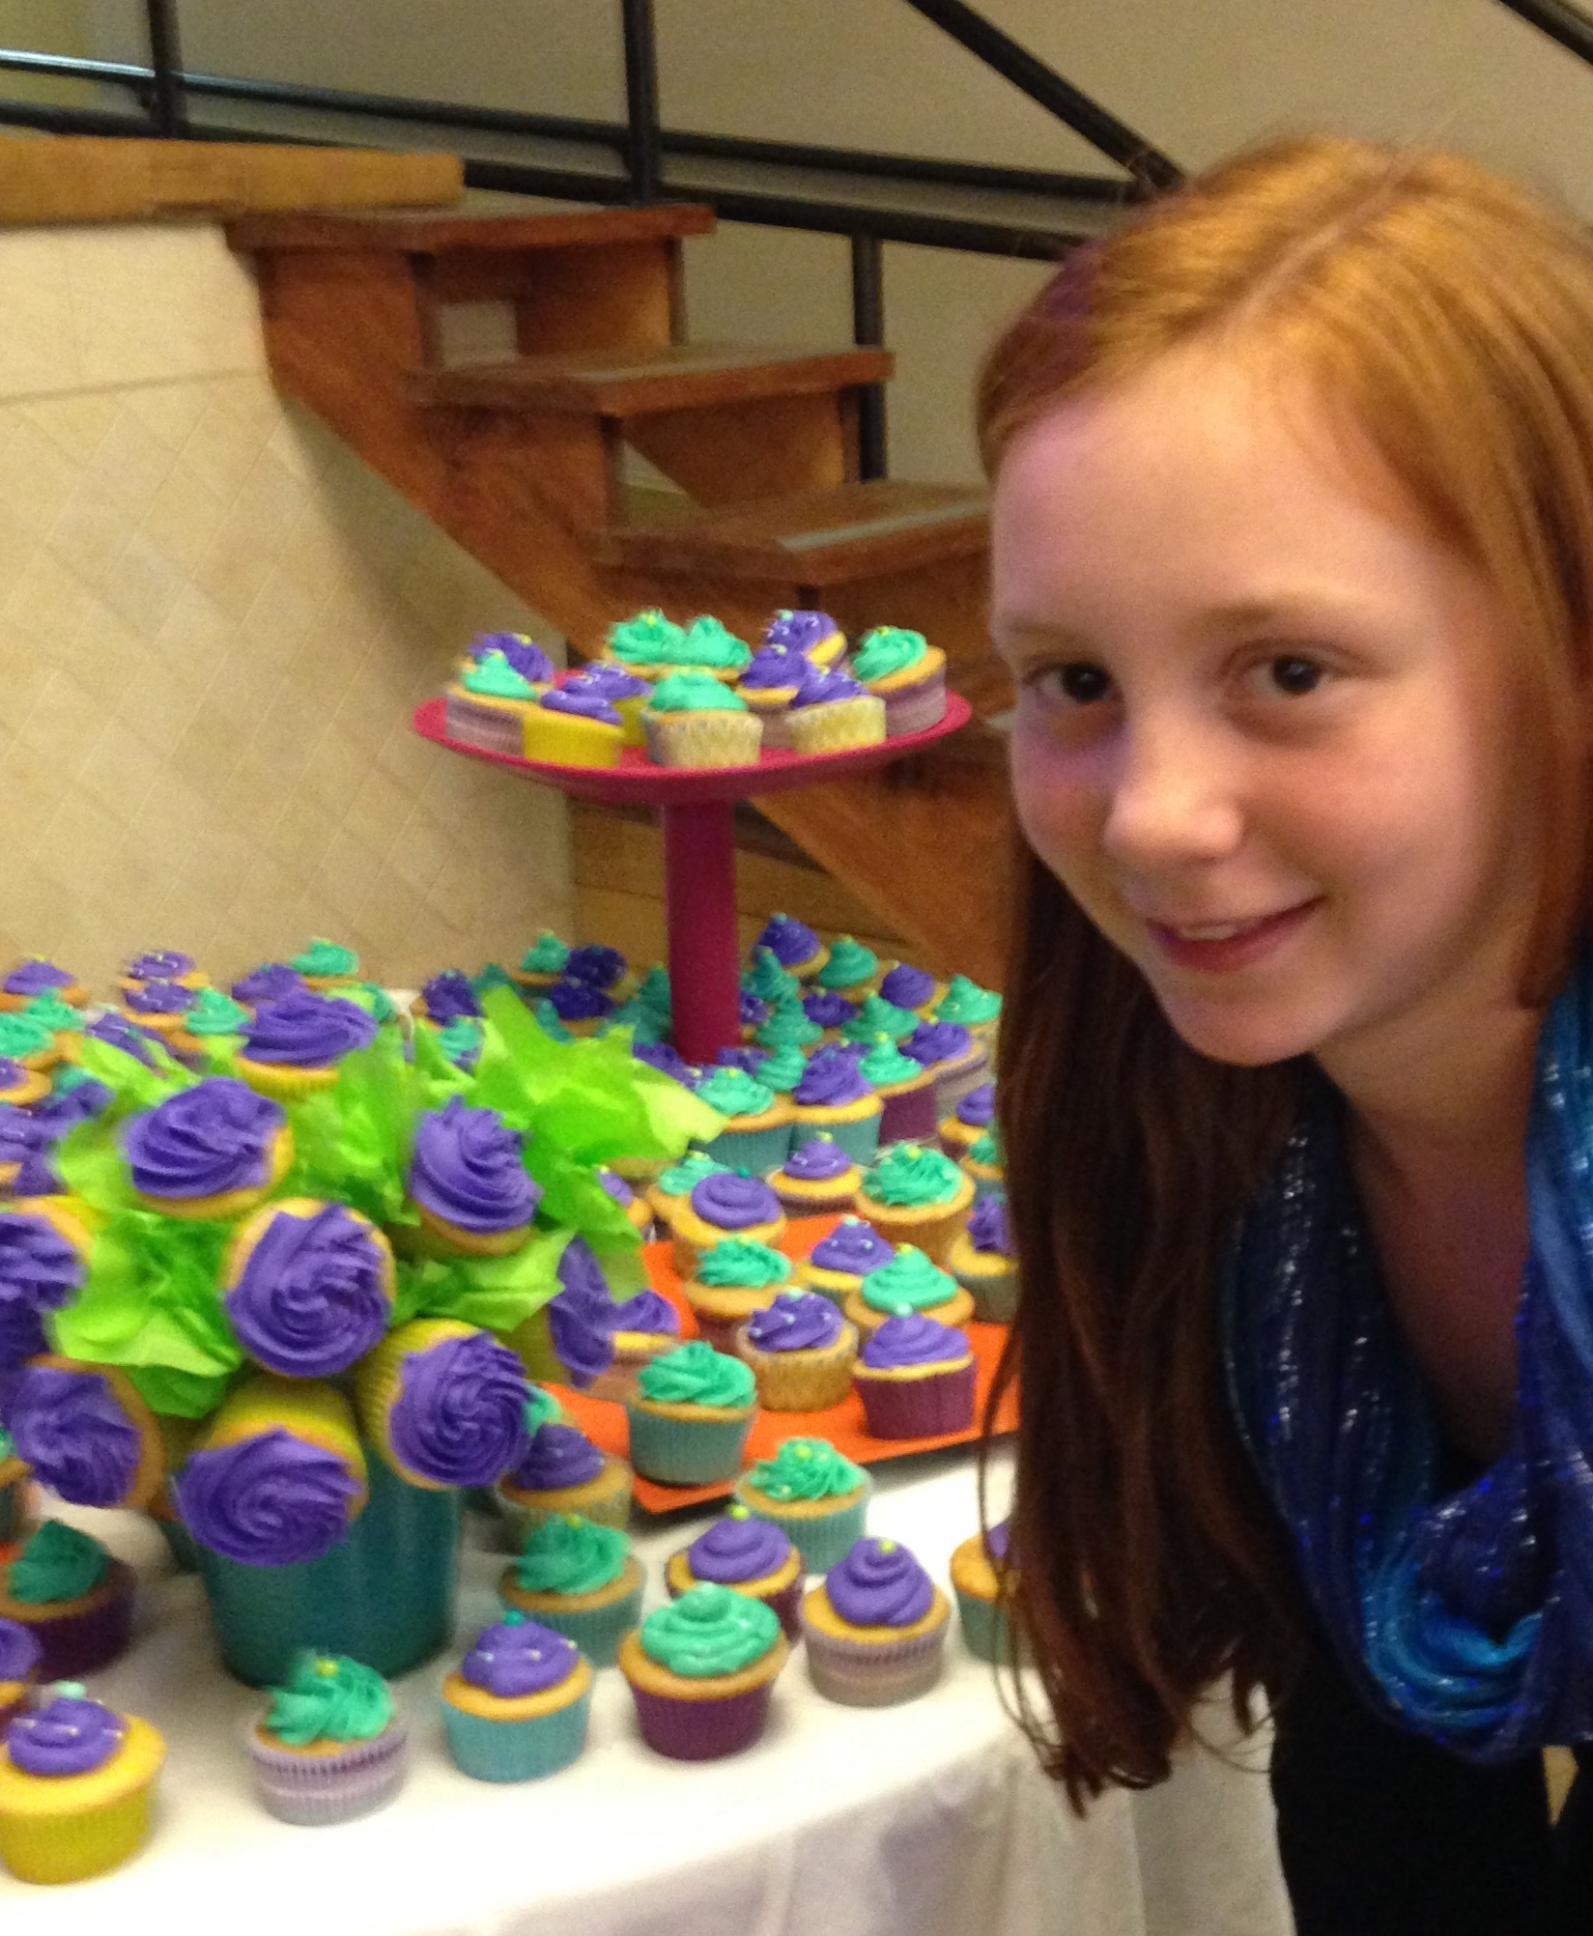 An 11-Year-Old Understands Joyful Sacrifice More Than I Do